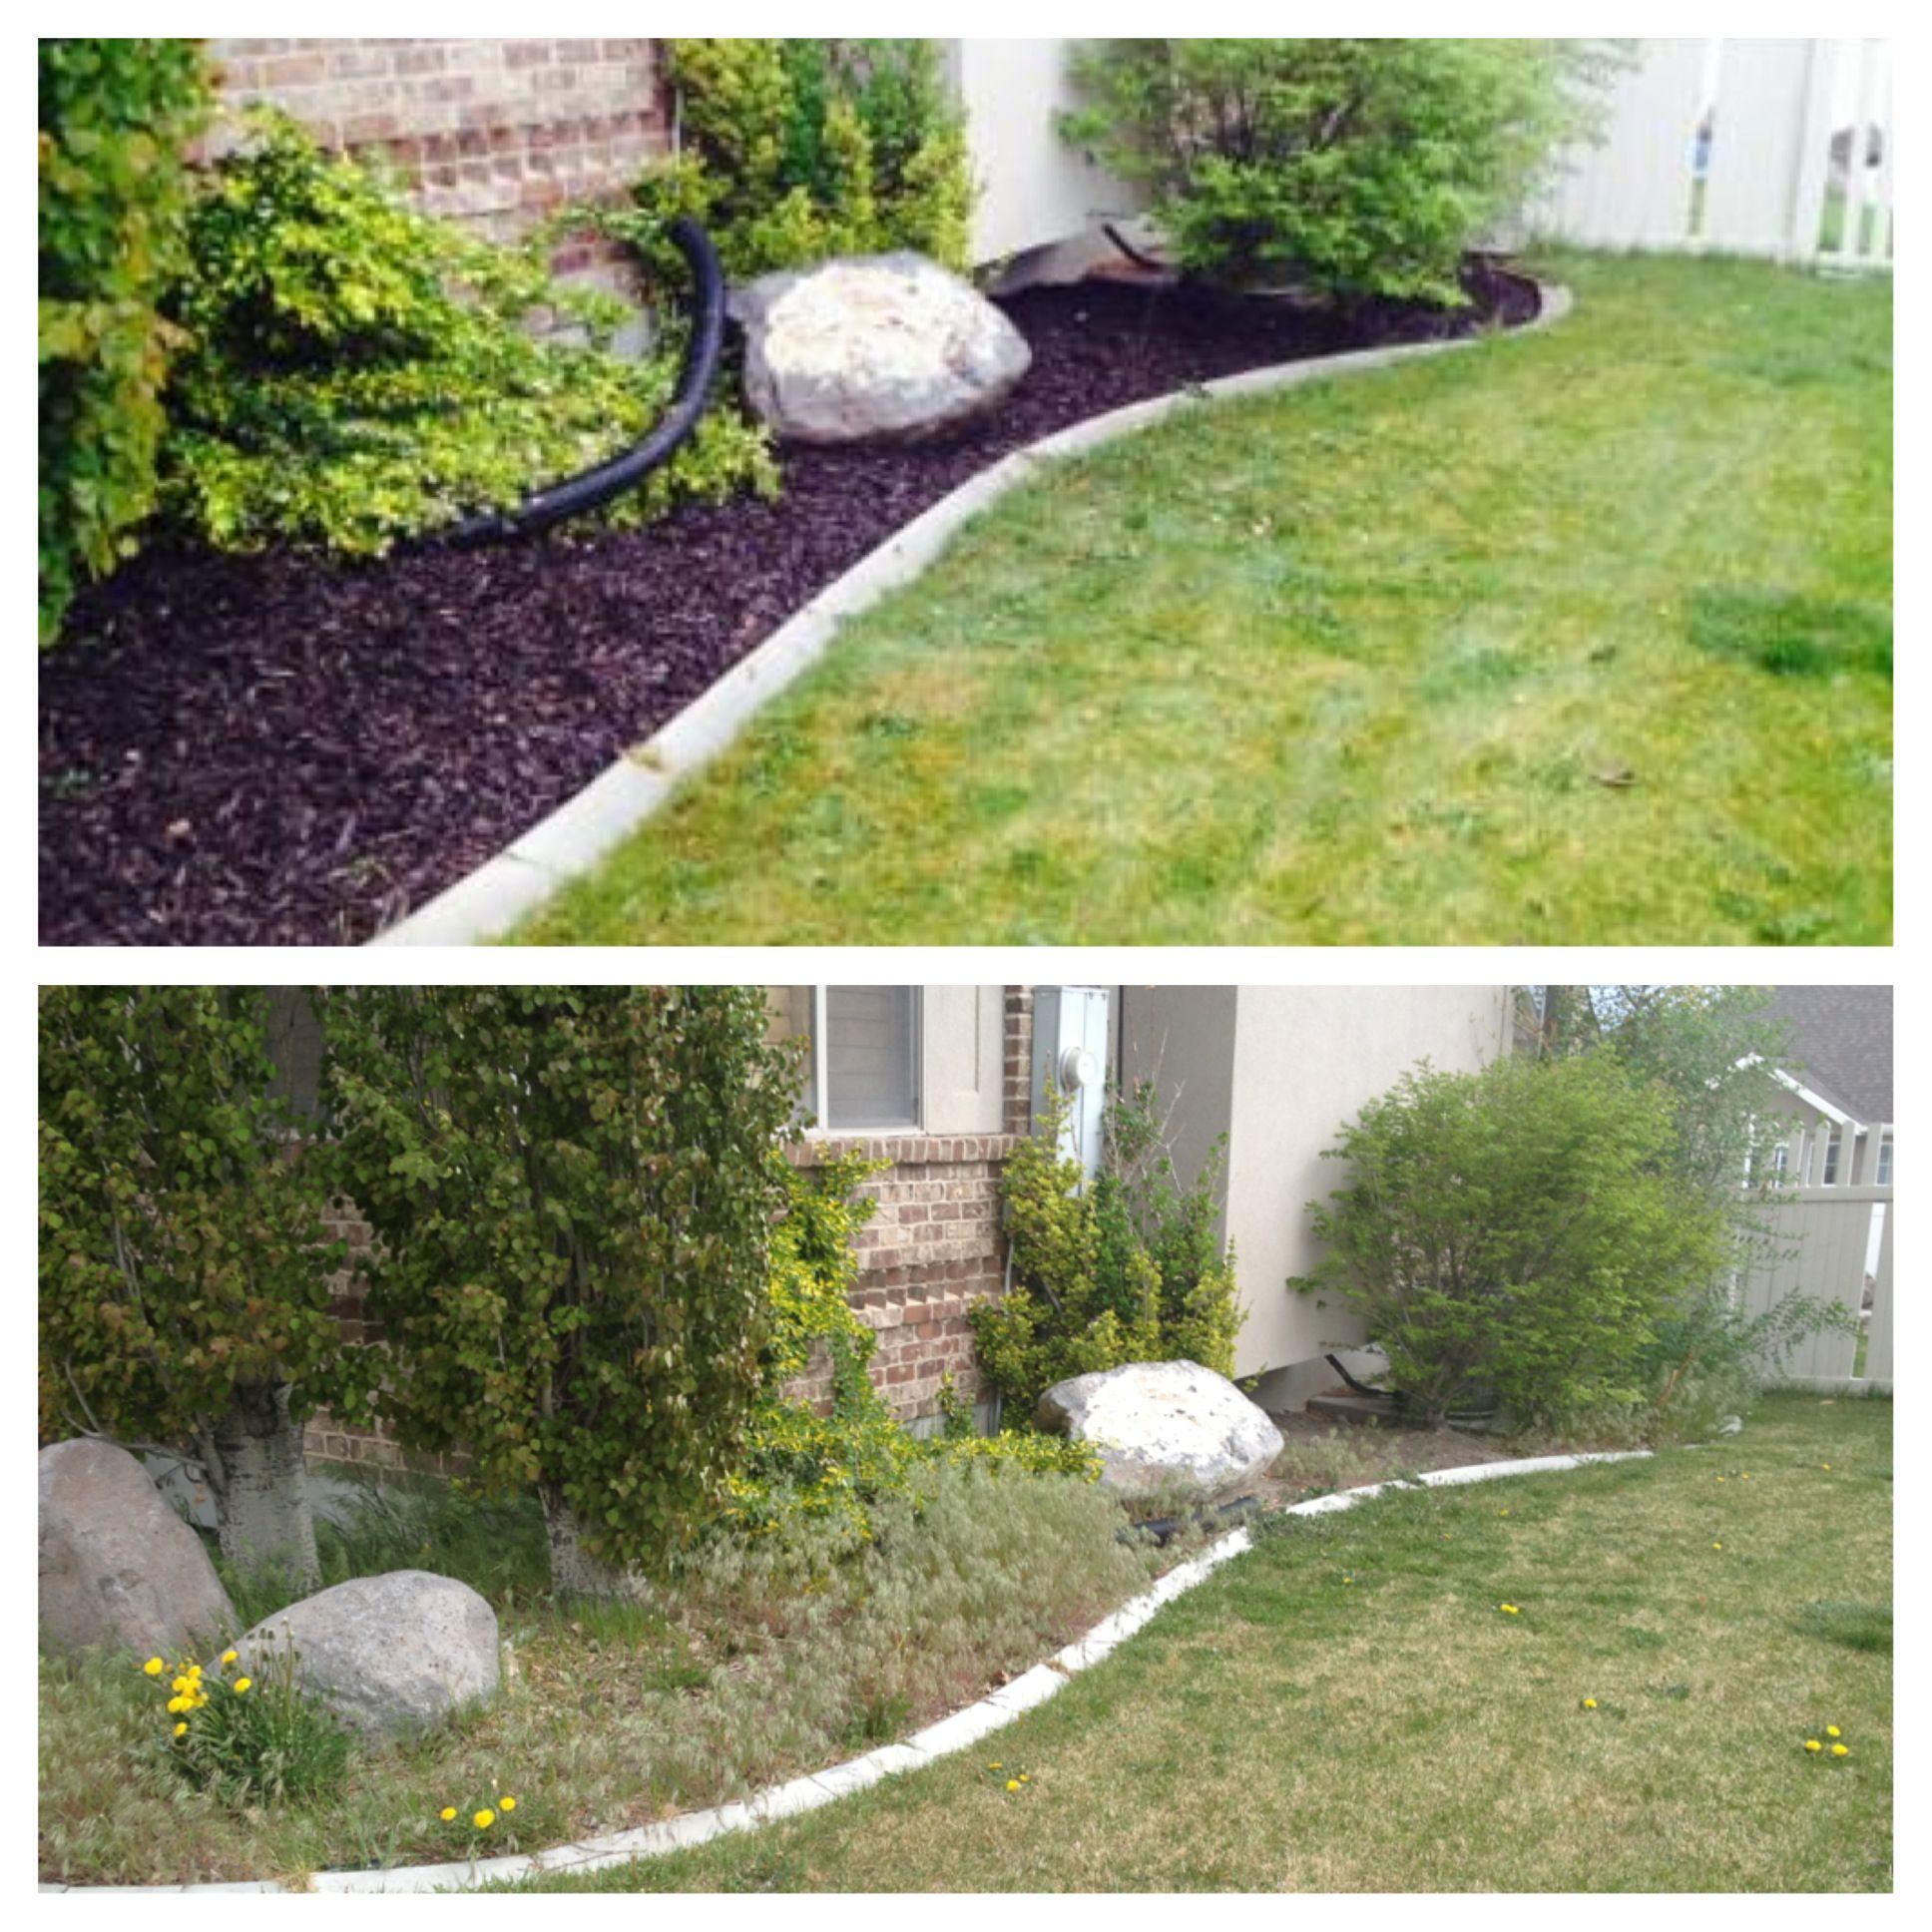 Spring Yard Clean Up Weeding And Mulch Installed The Dark Brown